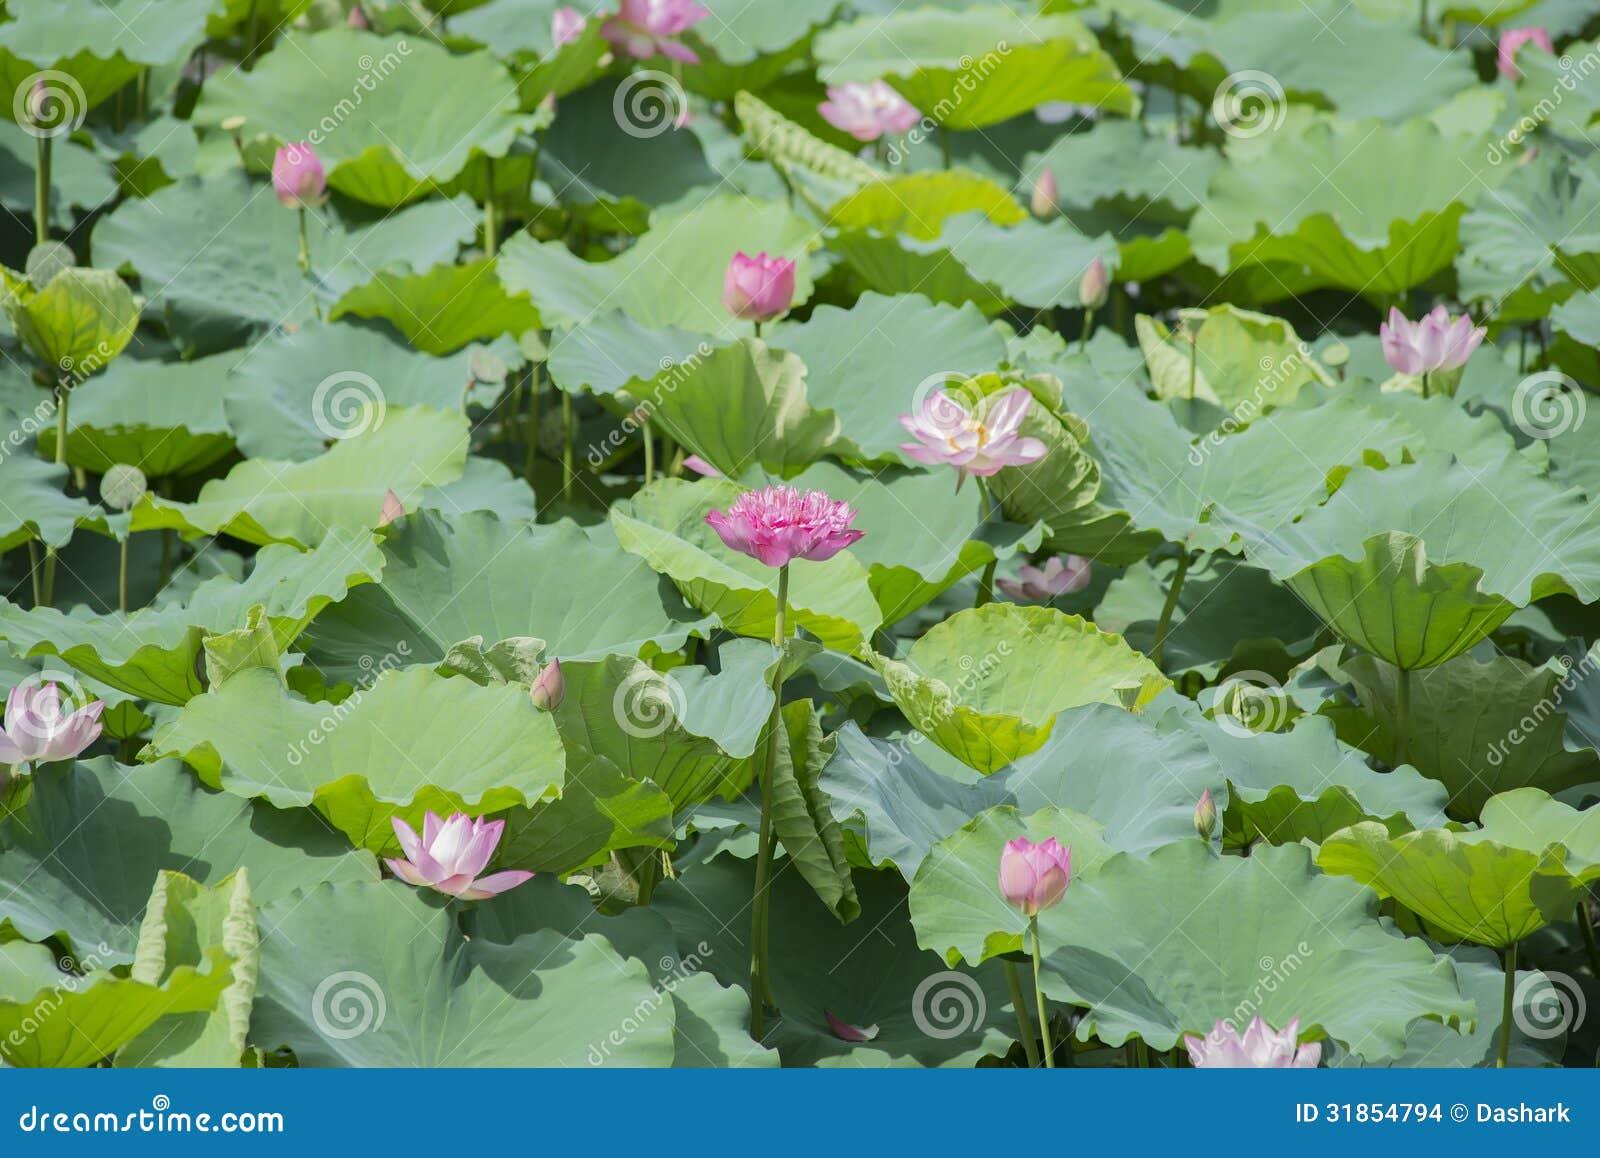 Blooming lotus flower pond 31854794g 1300958 pixels louts blooming lotus flower pond 31854794g 1300958 pixels izmirmasajfo Gallery